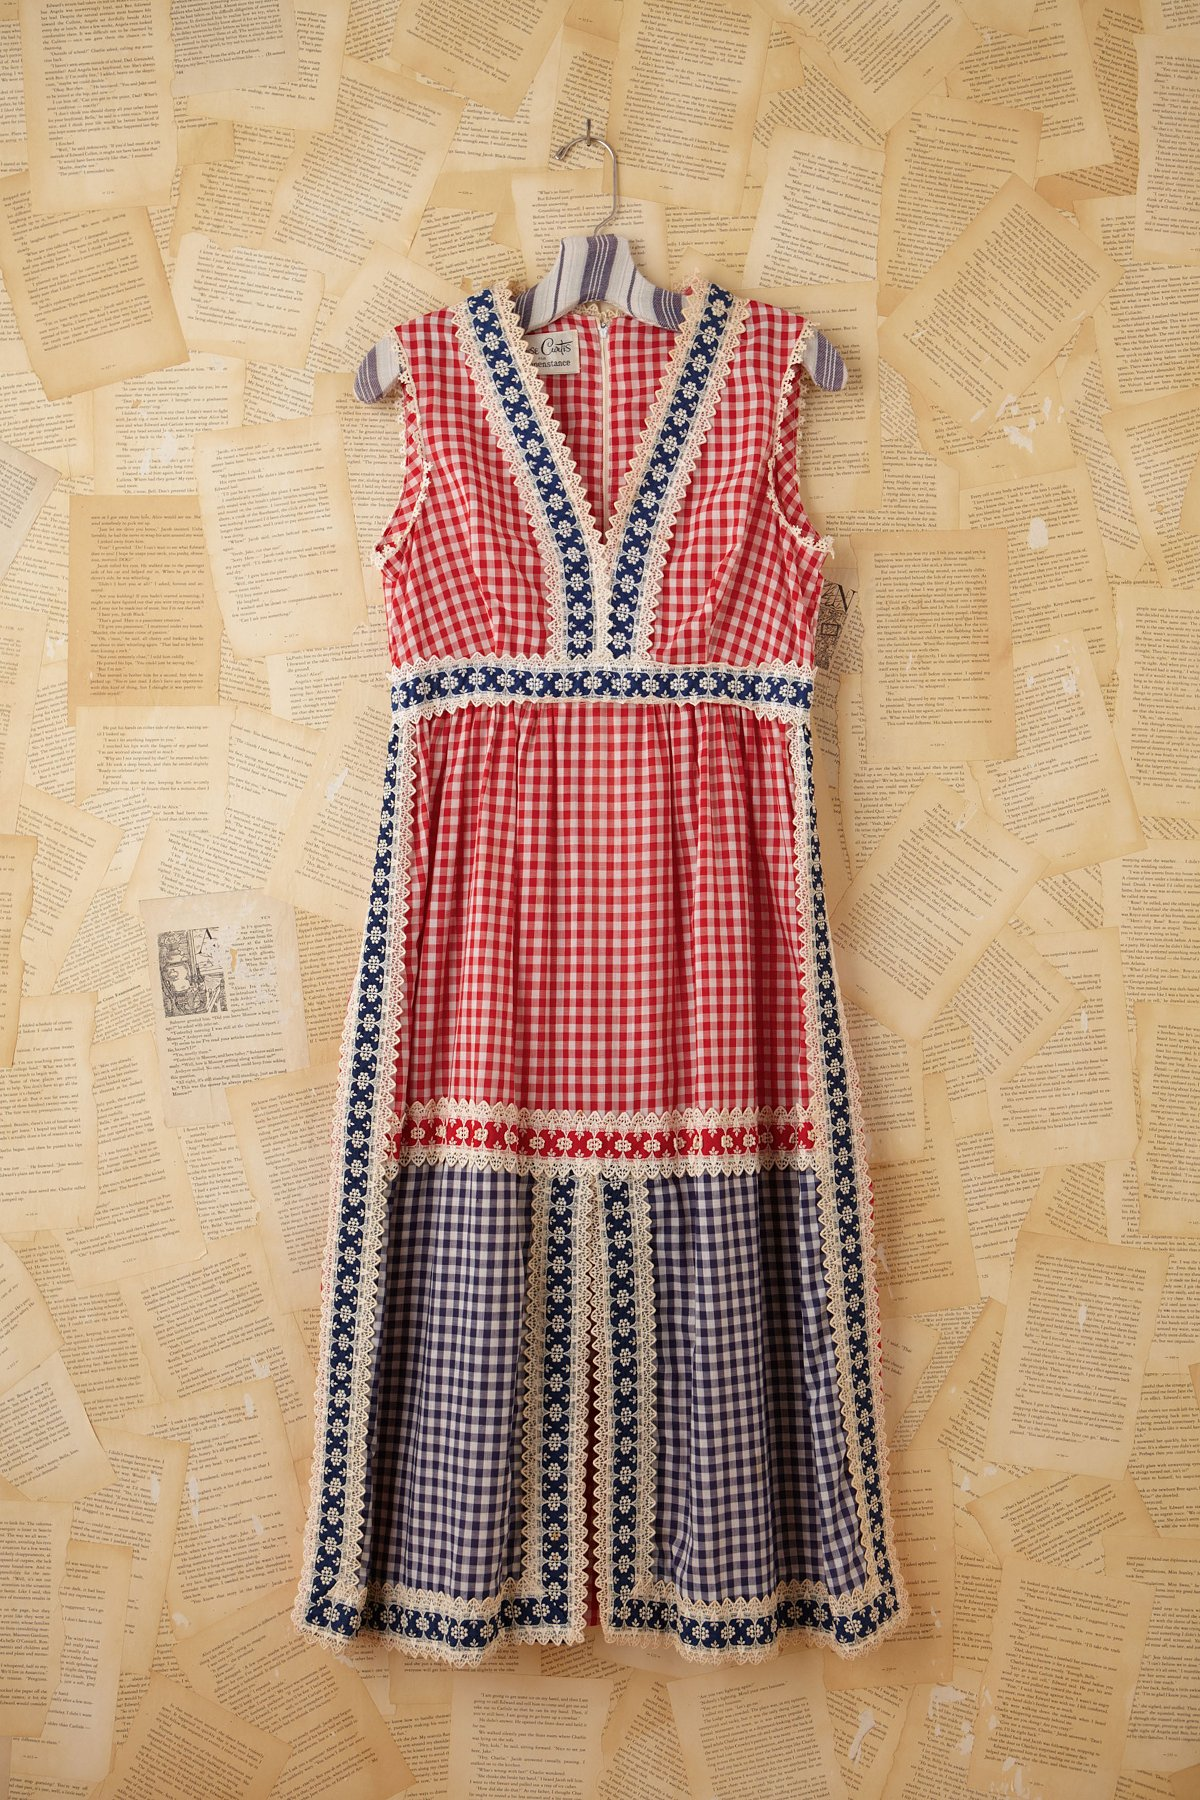 Vintage Gingham and Crochet Dress